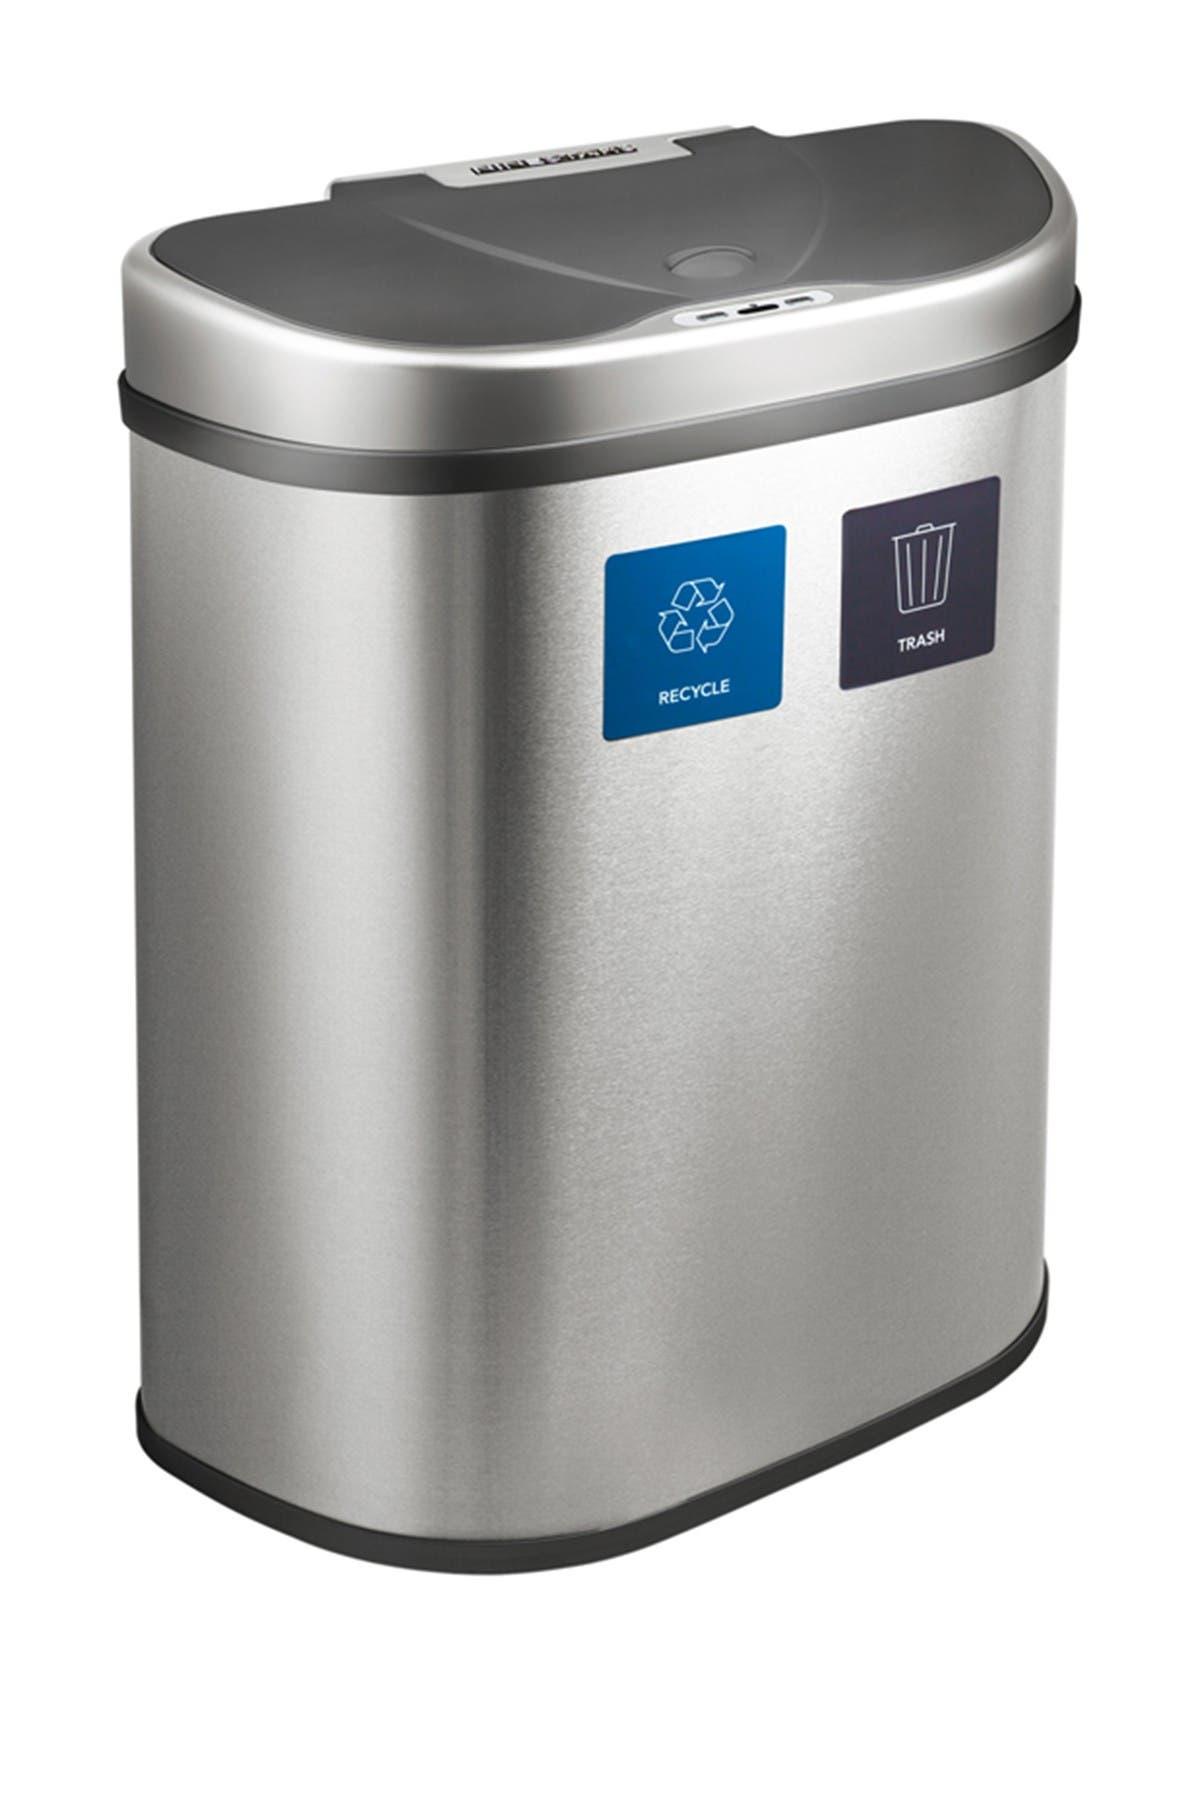 Image of NINESTARS Silver/Black Motion Sensor Trash Can - 18.5 Gallons